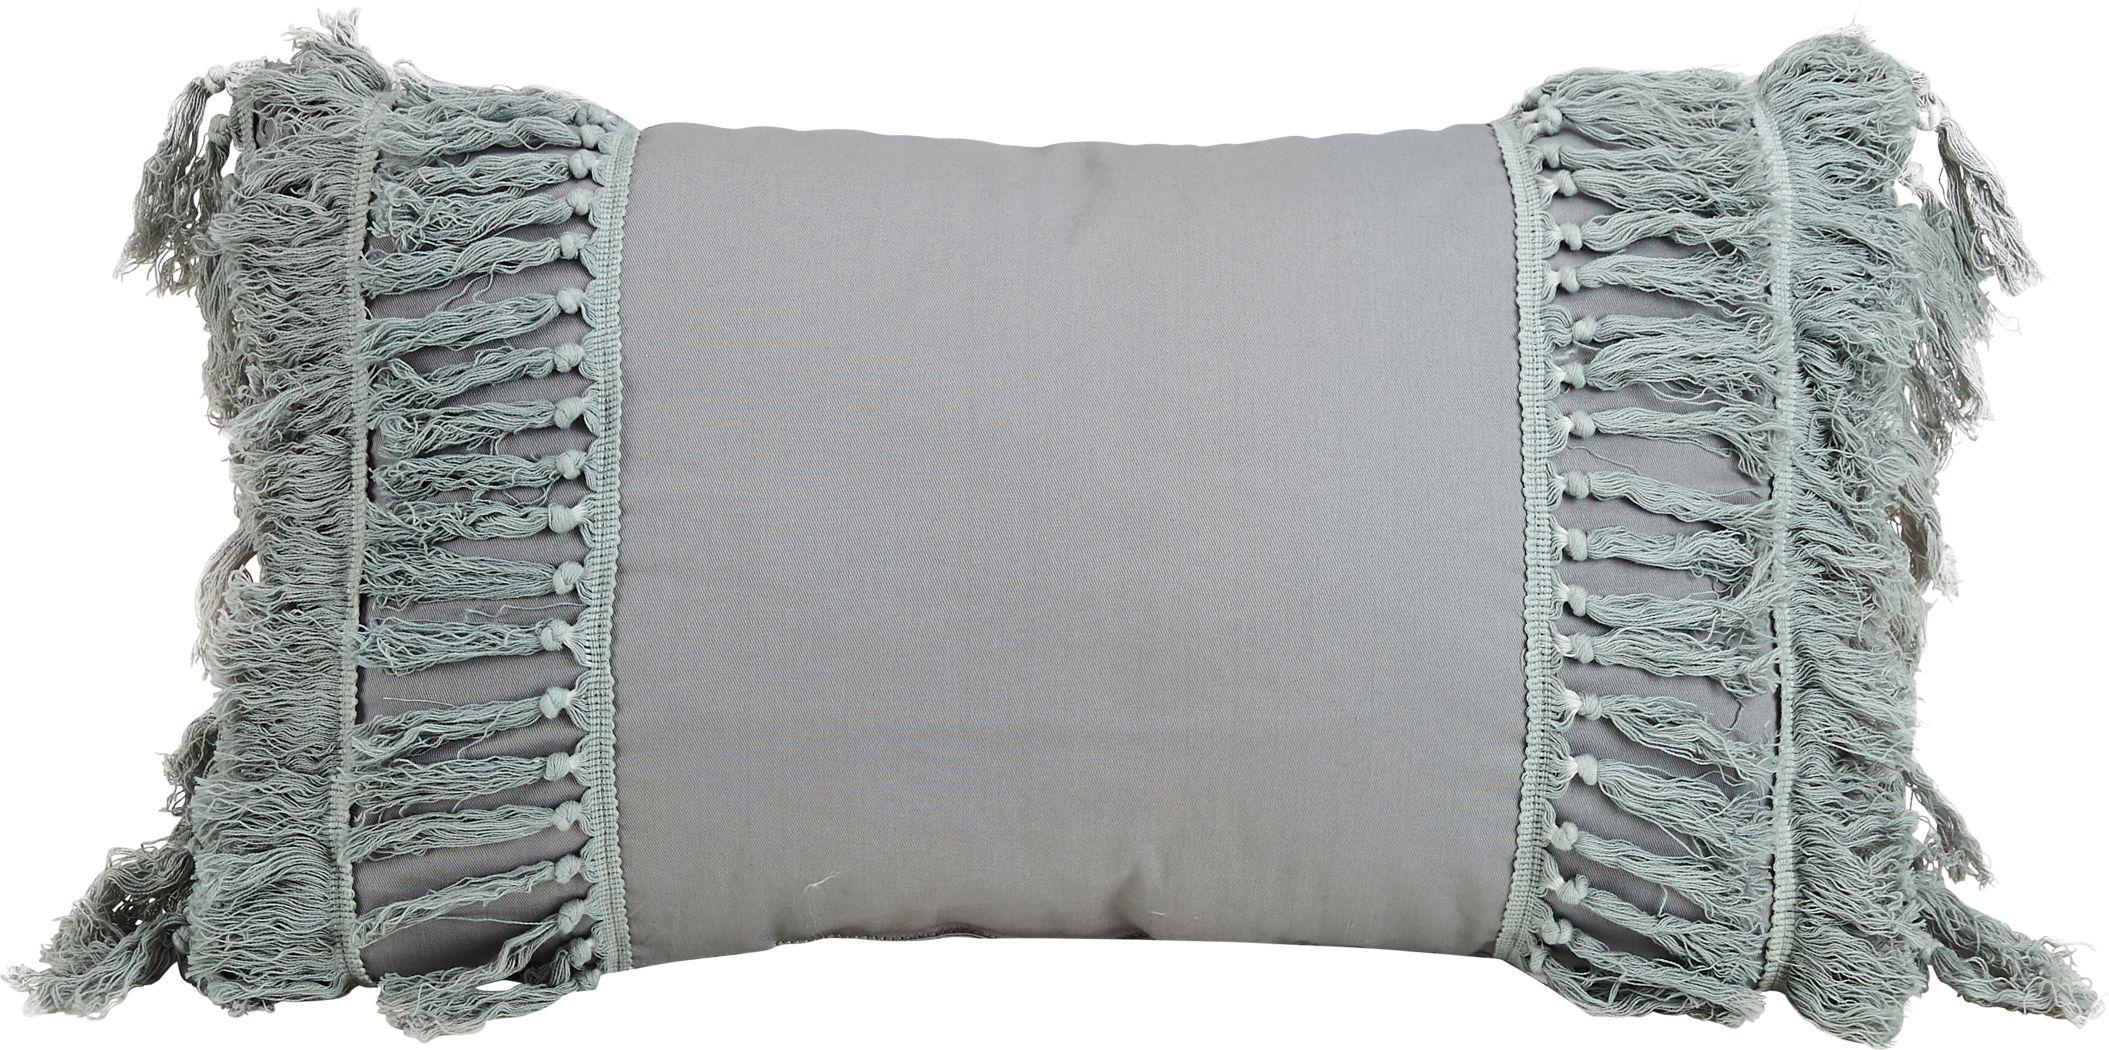 Arlesia Gray Decorative Pillow